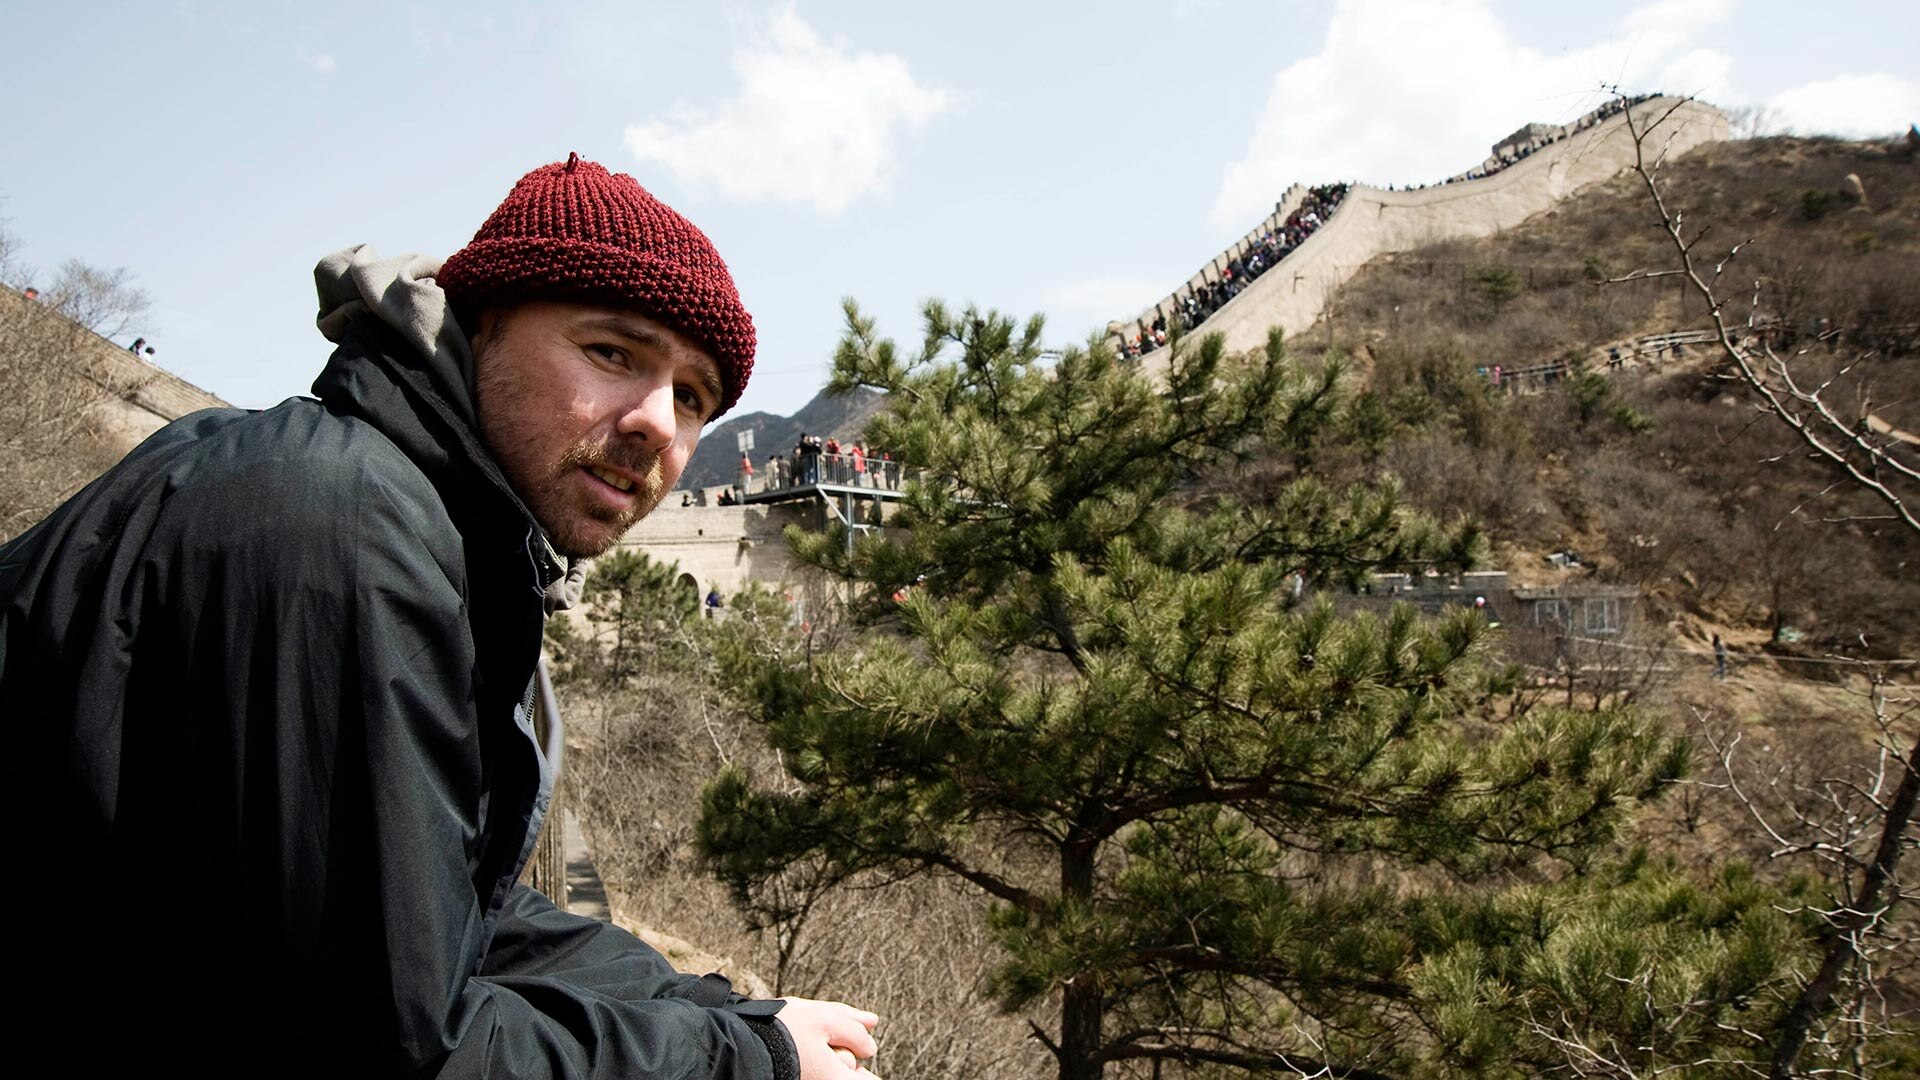 An Idiot Abroad: China